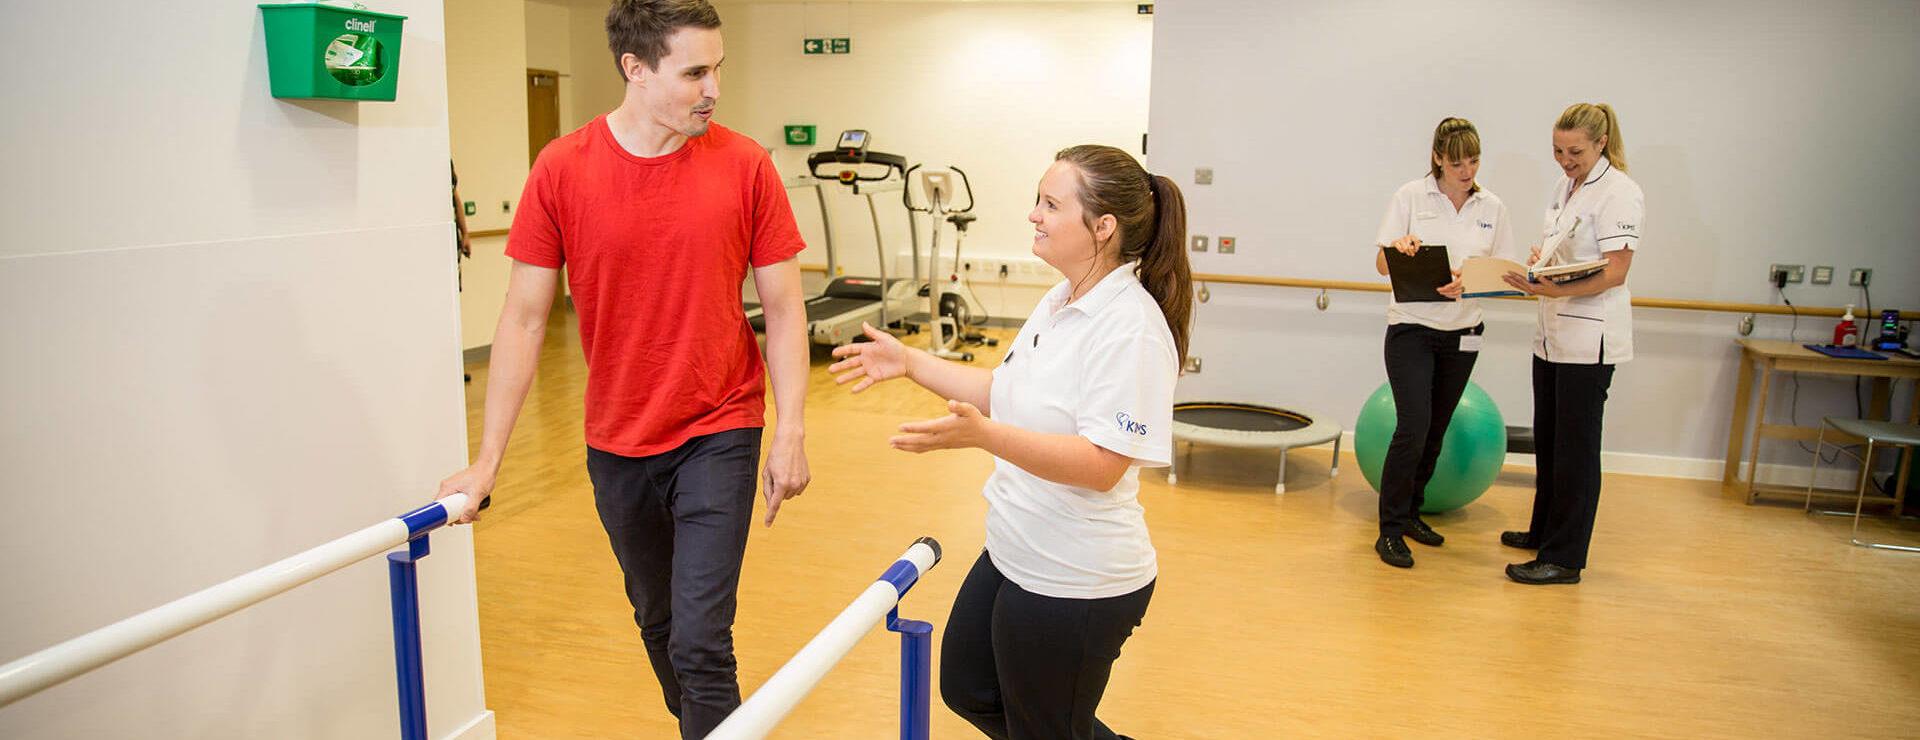 Physiotherapy Clinic & Treatments | KIMS Hospital, Kent